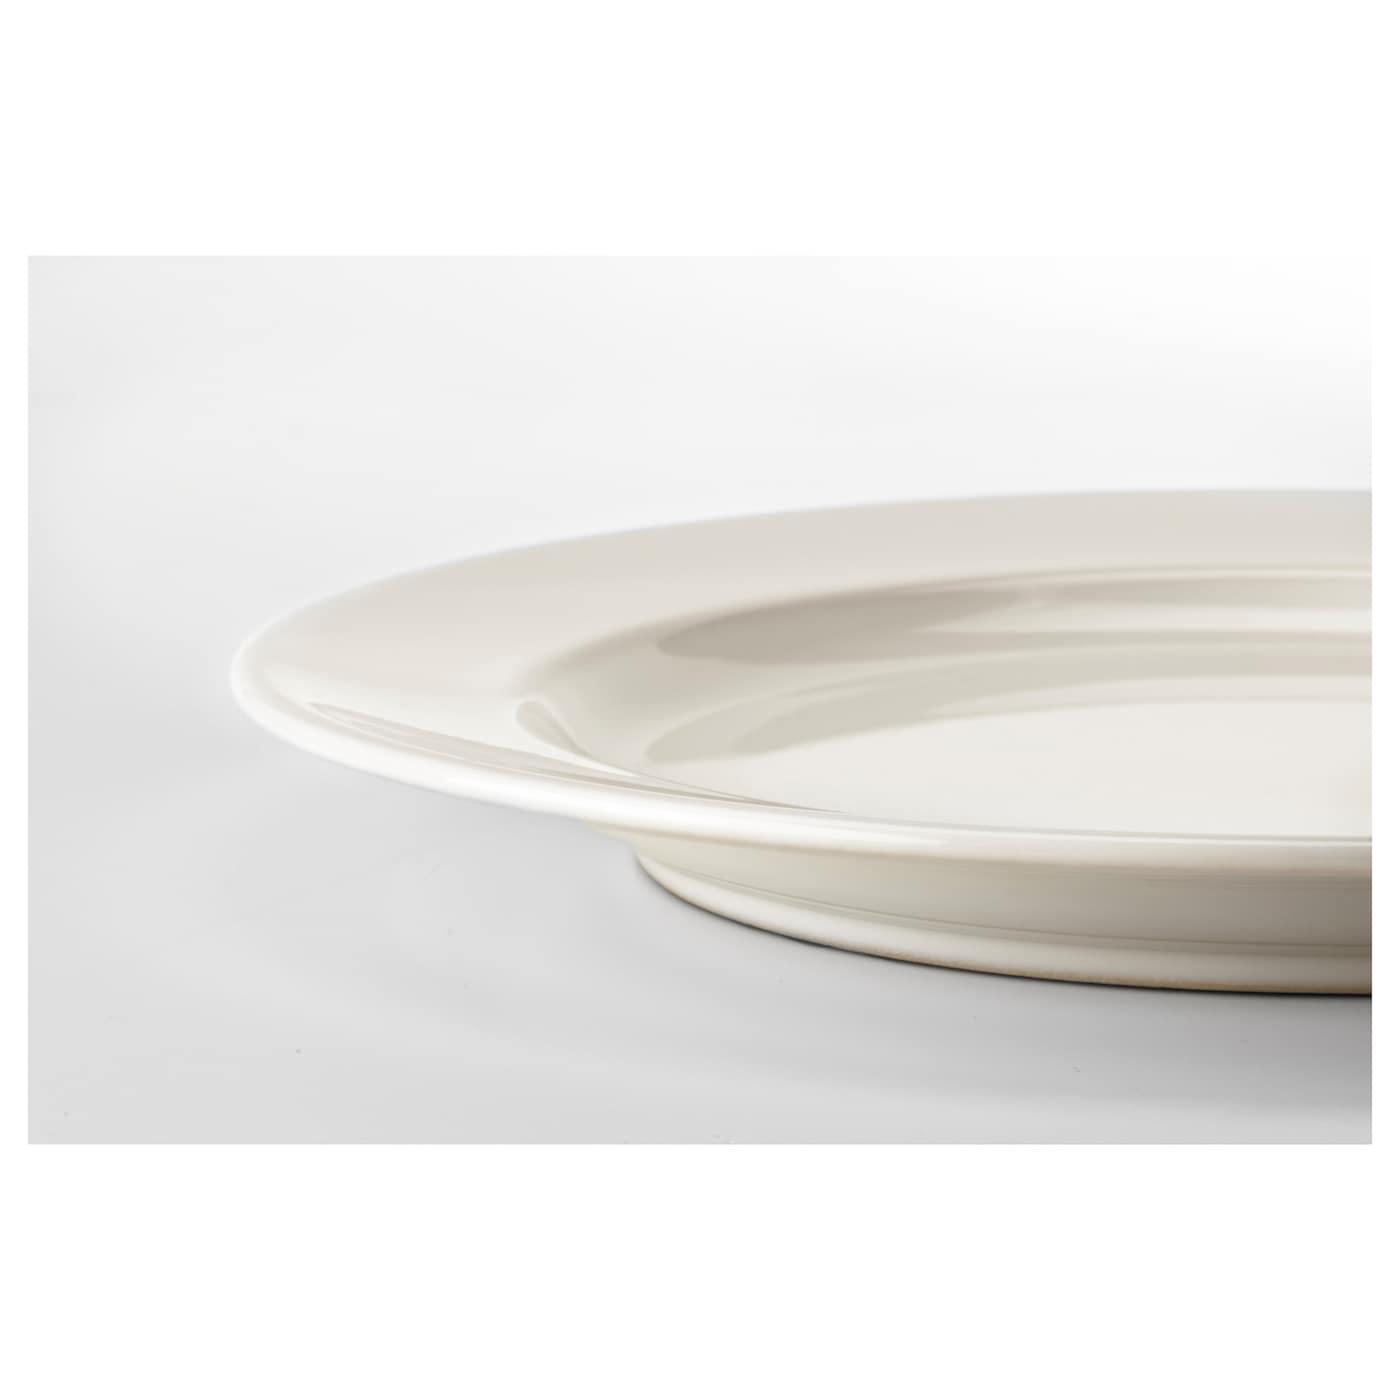 VARDAGEN 바르다겐 접시S, 오프화이트, 21 cm